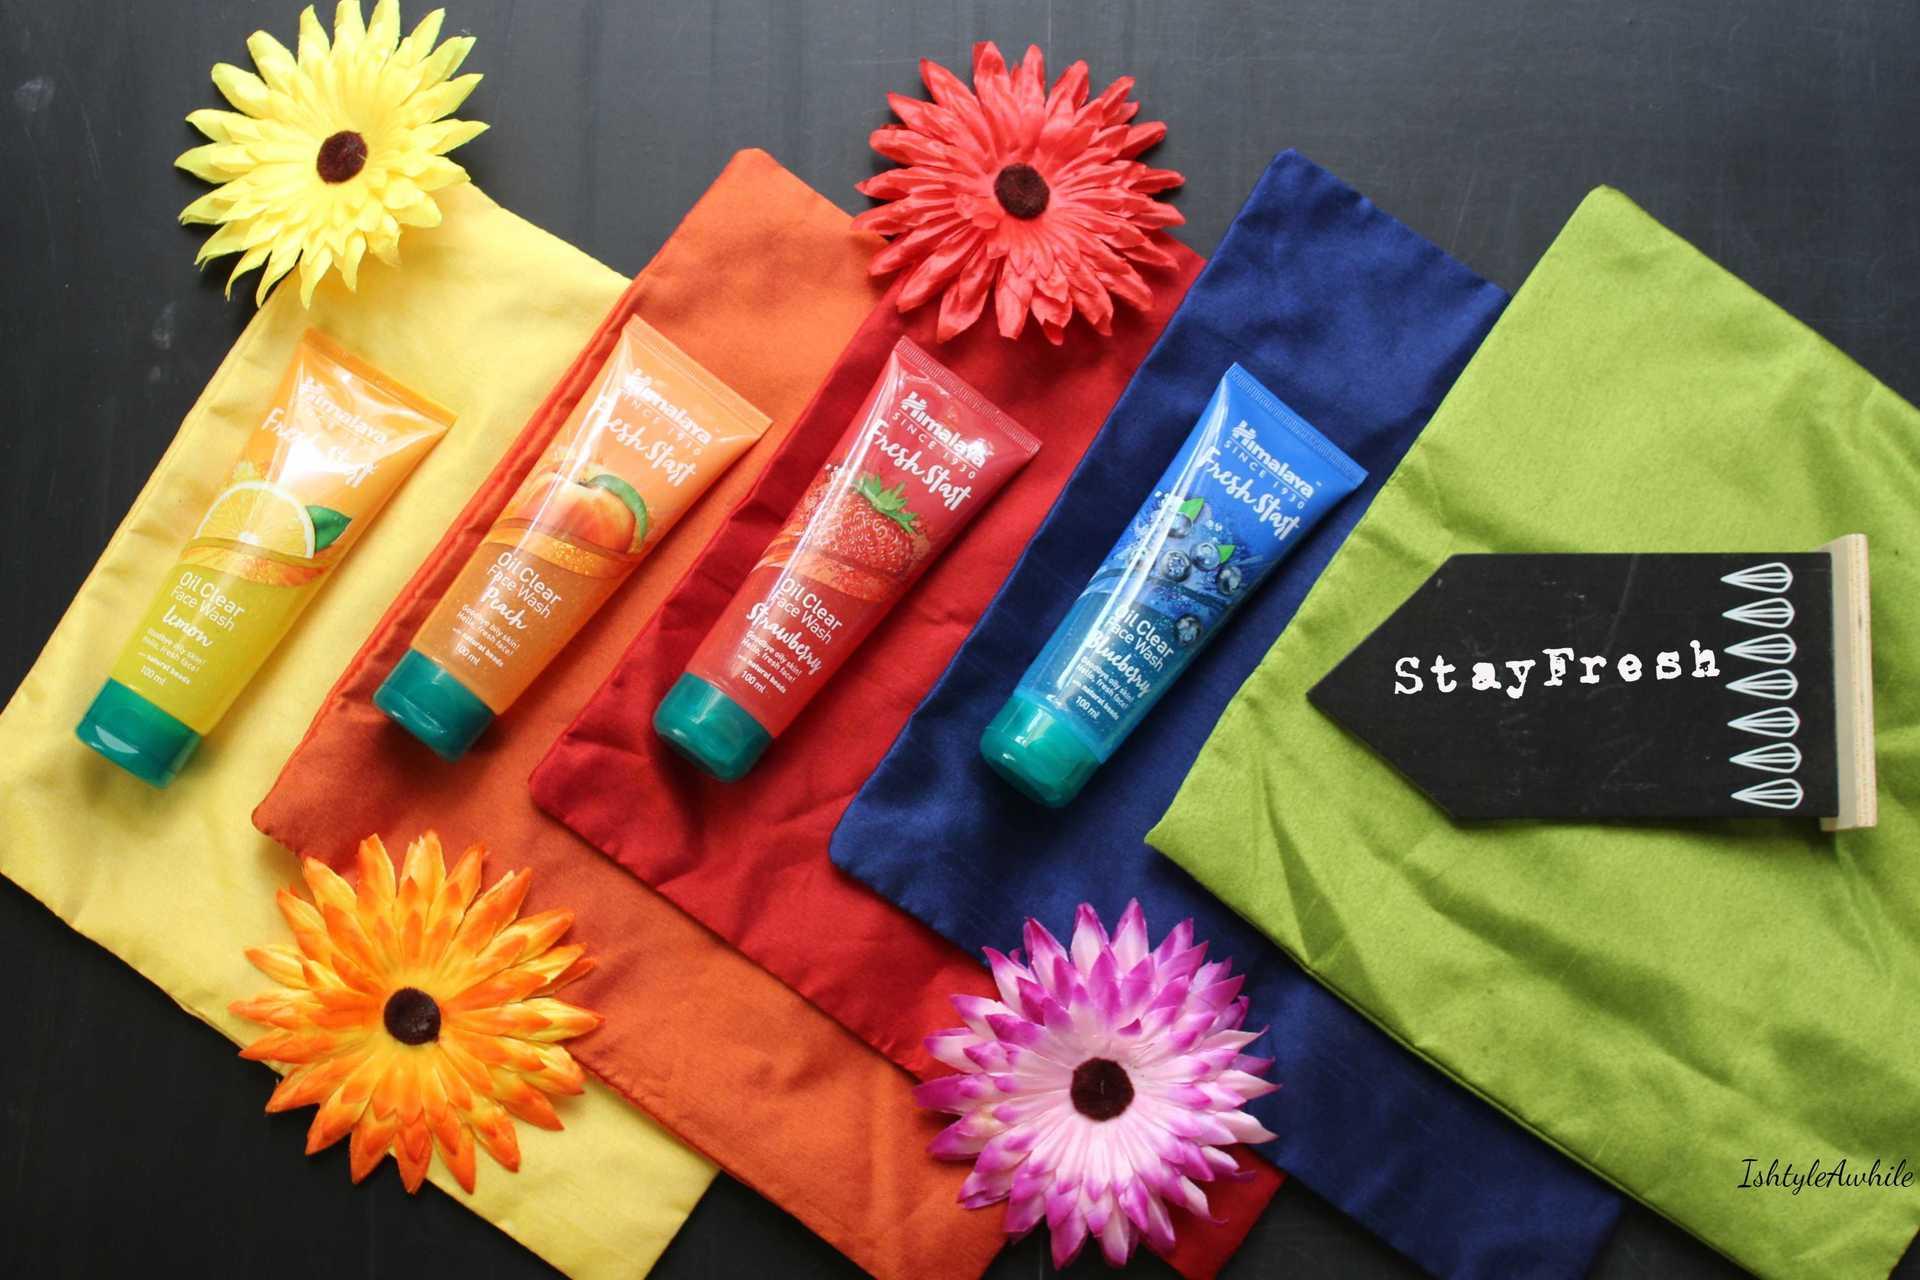 IshtyleAwhile - Himalaya Fresh Start facial wash review